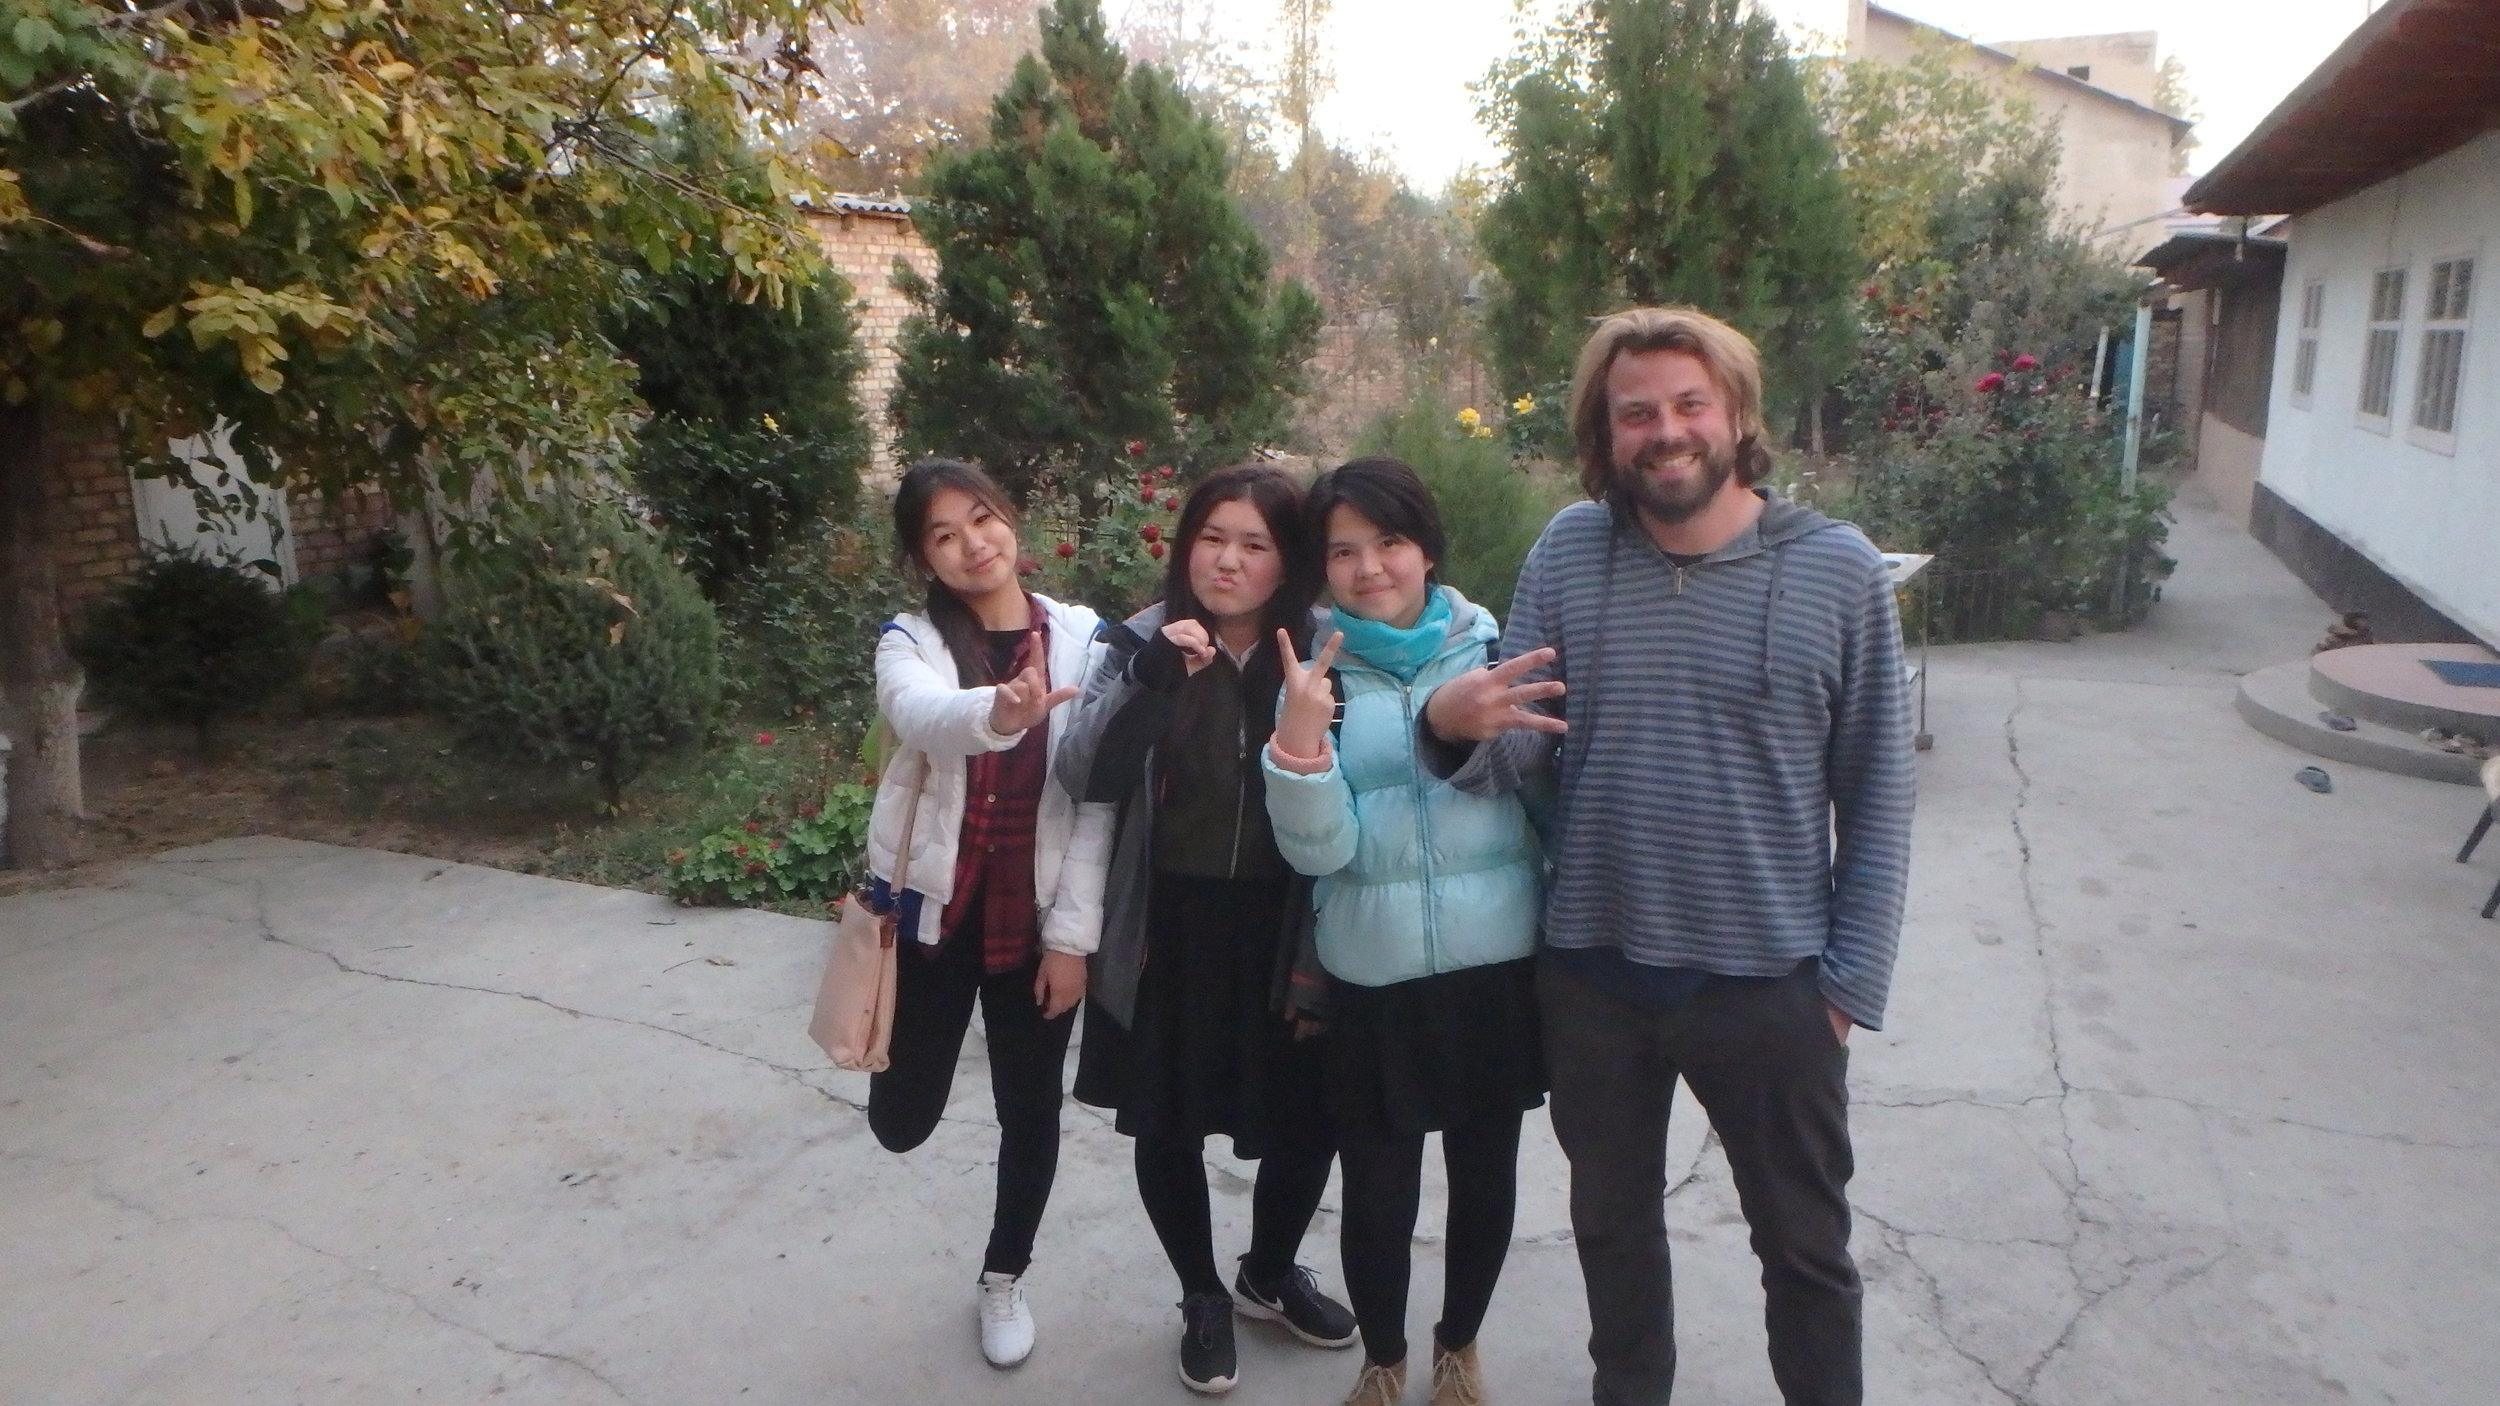 English students teaching me how to take a good photo, Toktugul. (L-O-V-E).